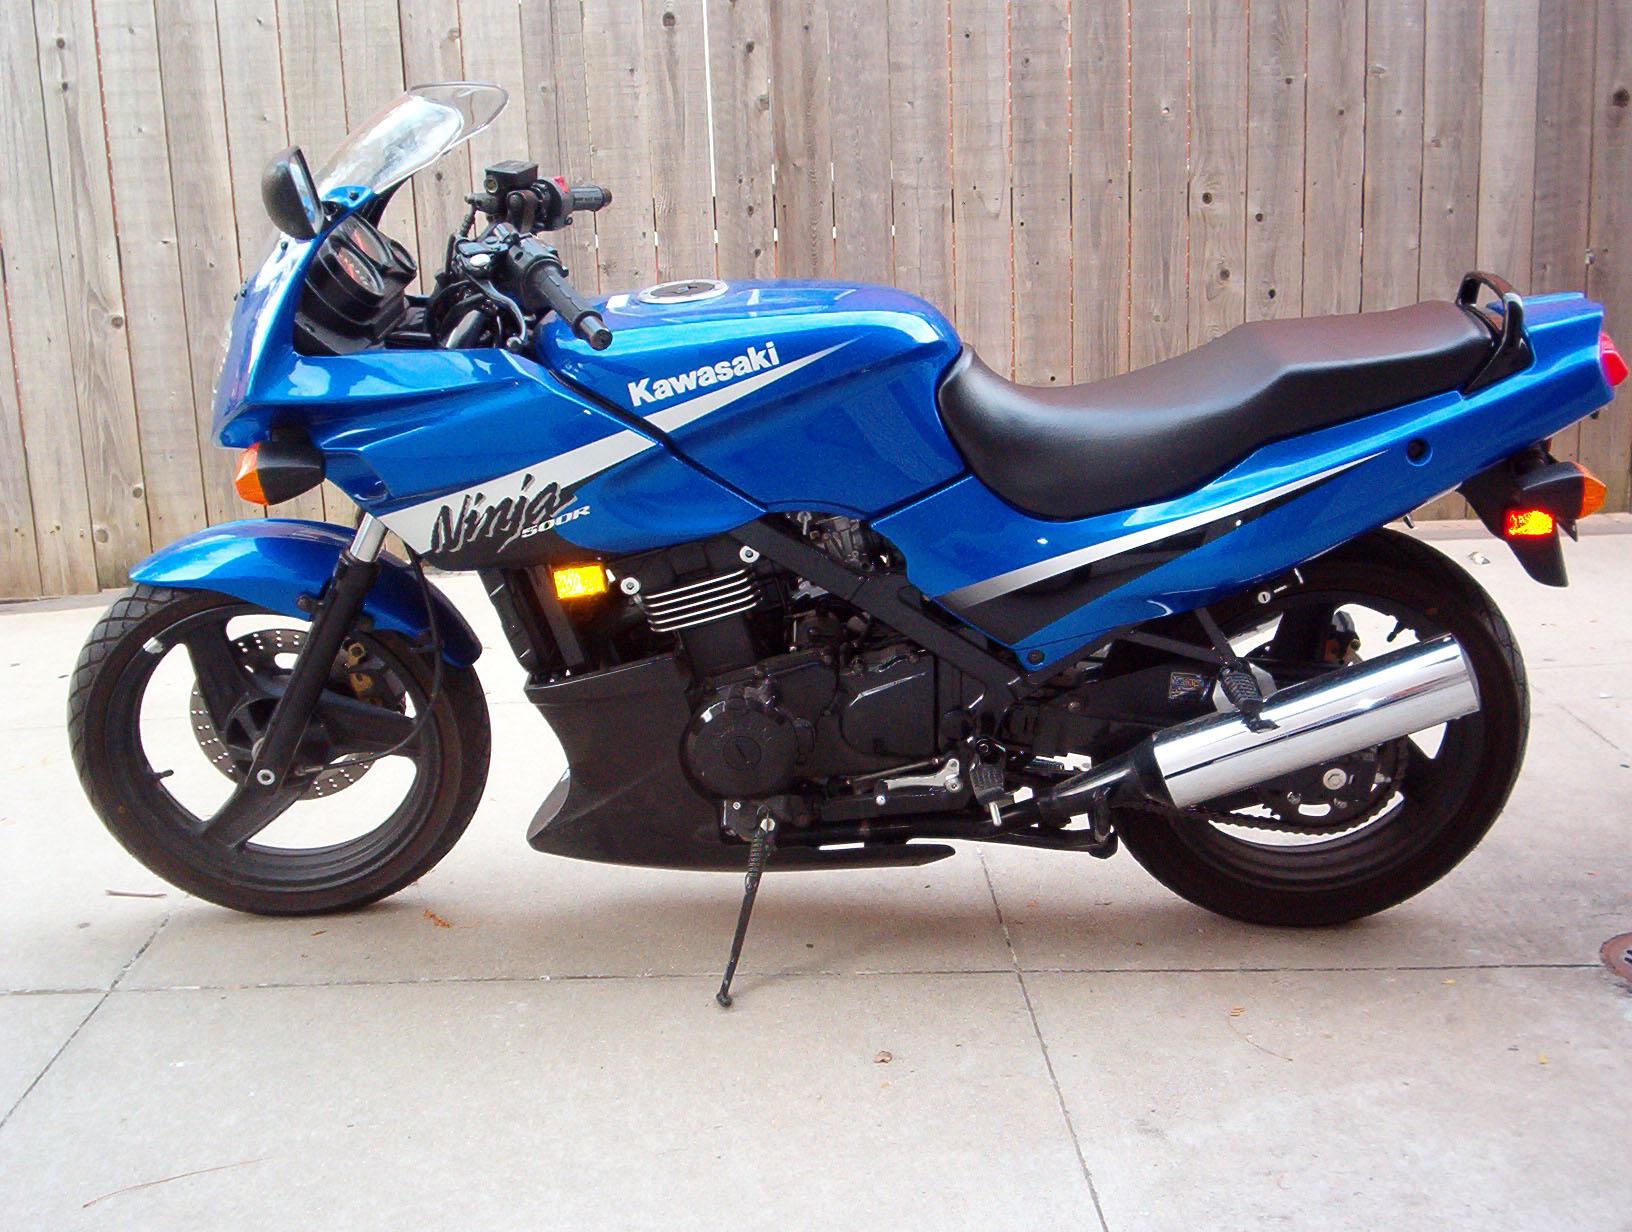 2005 Kawasaki Ninja 500R